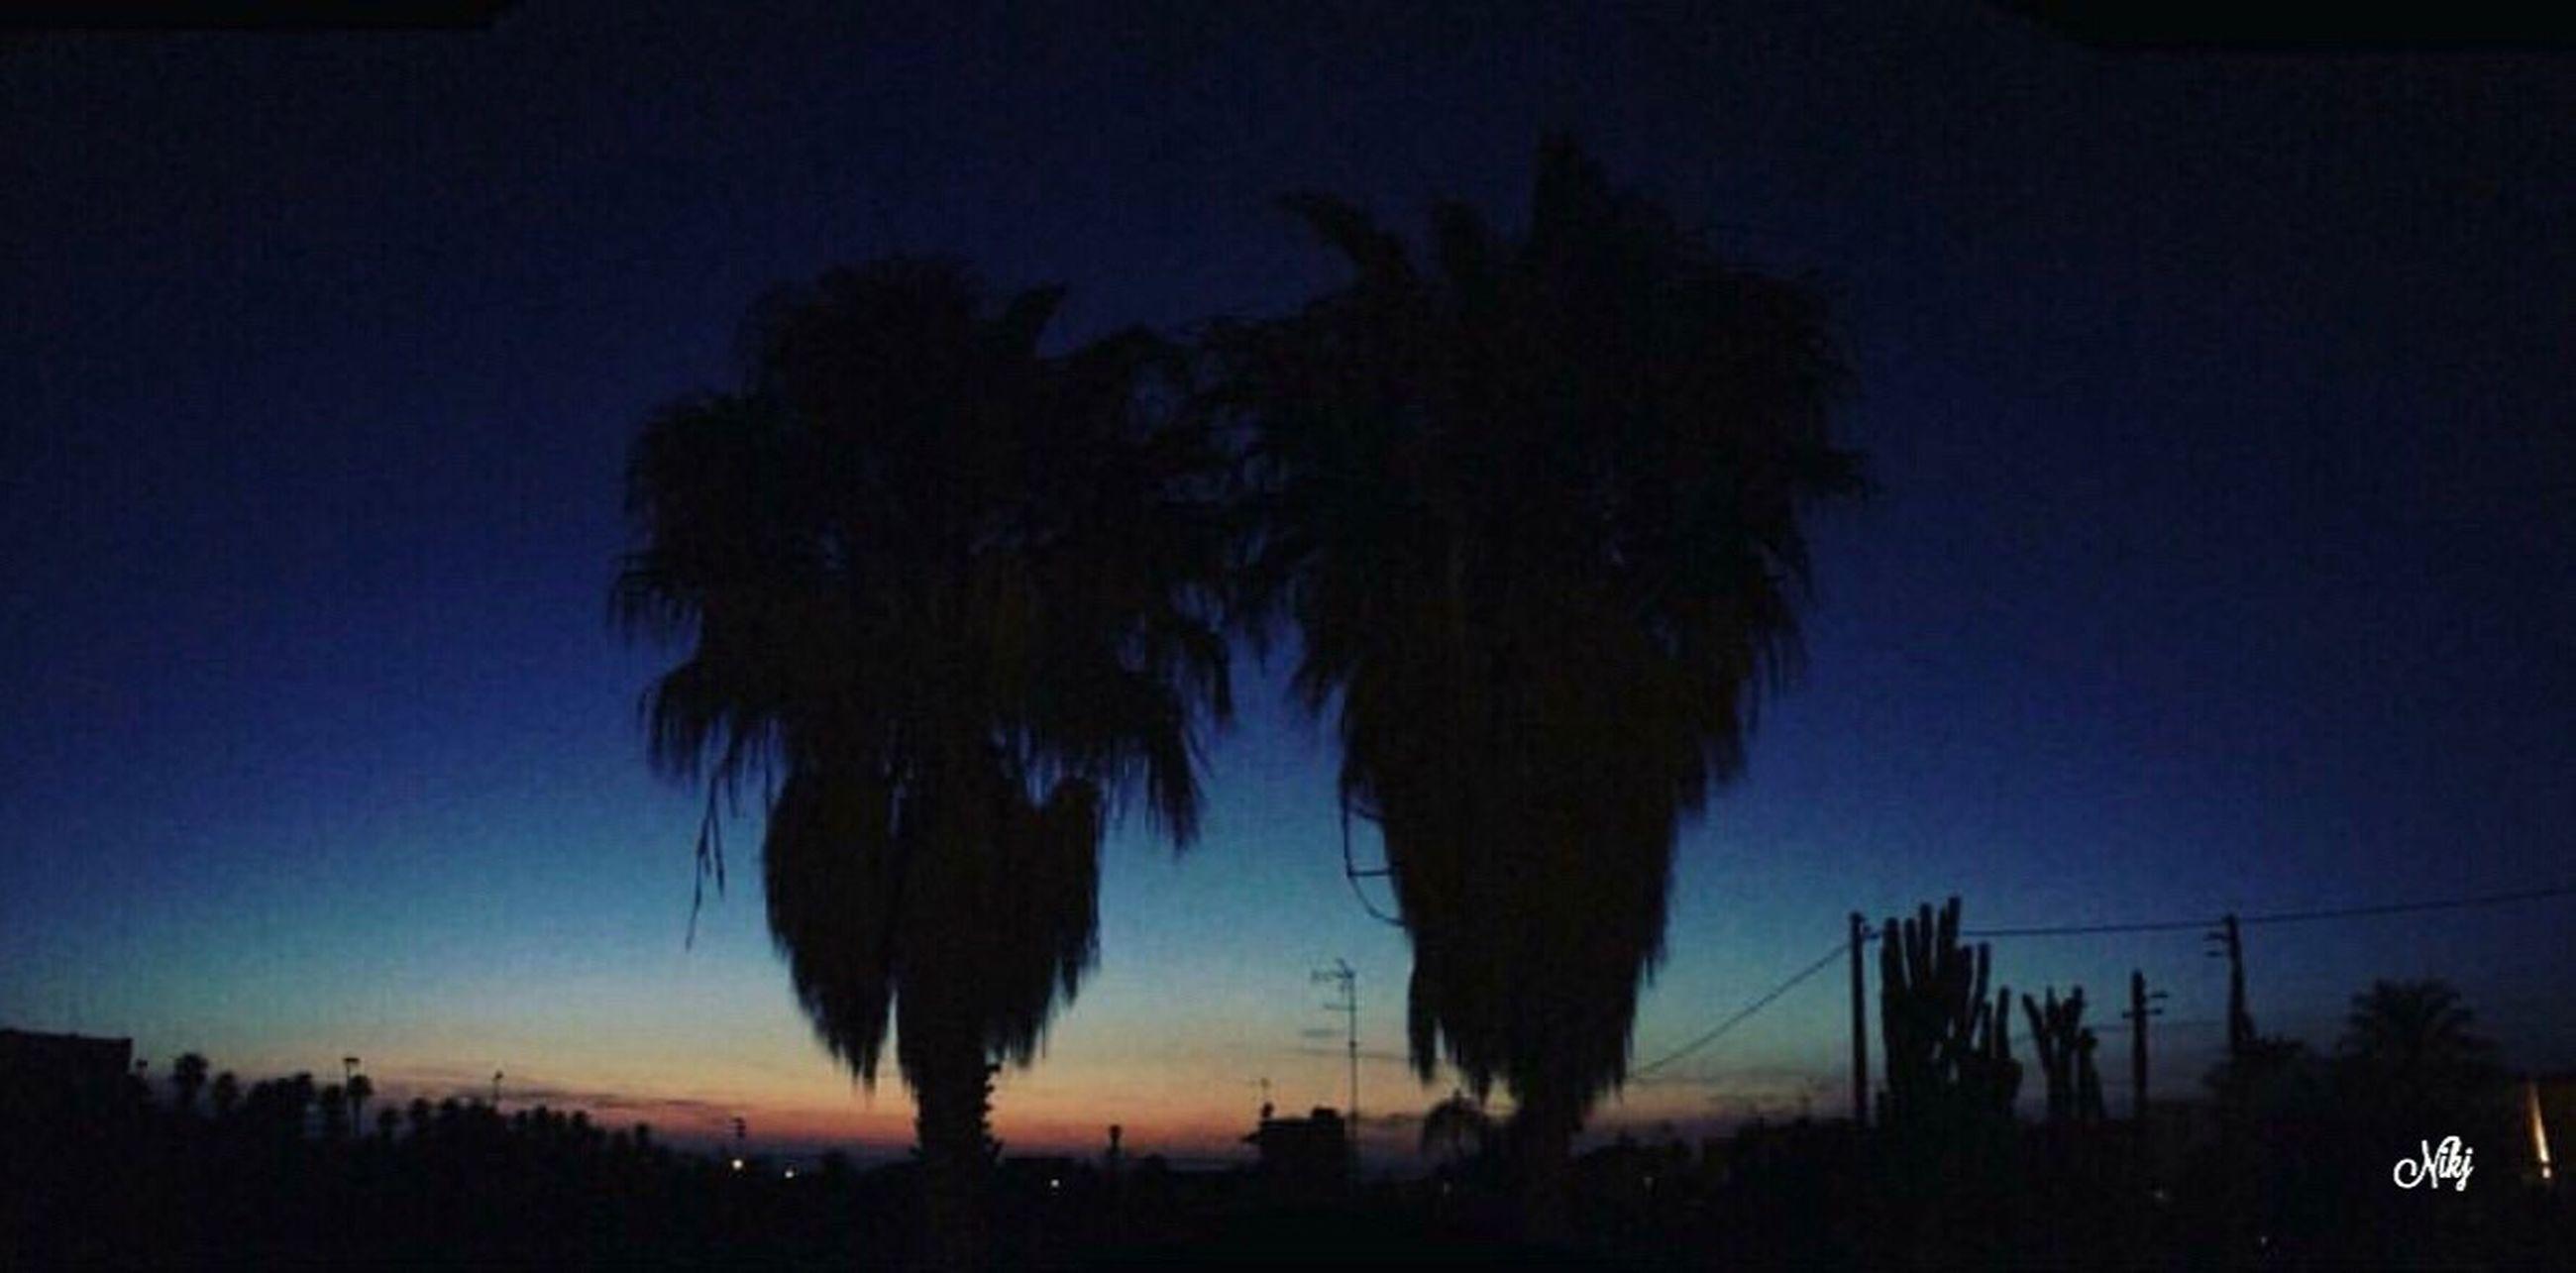 silhouette, tree, night, sky, outdoors, no people, nature